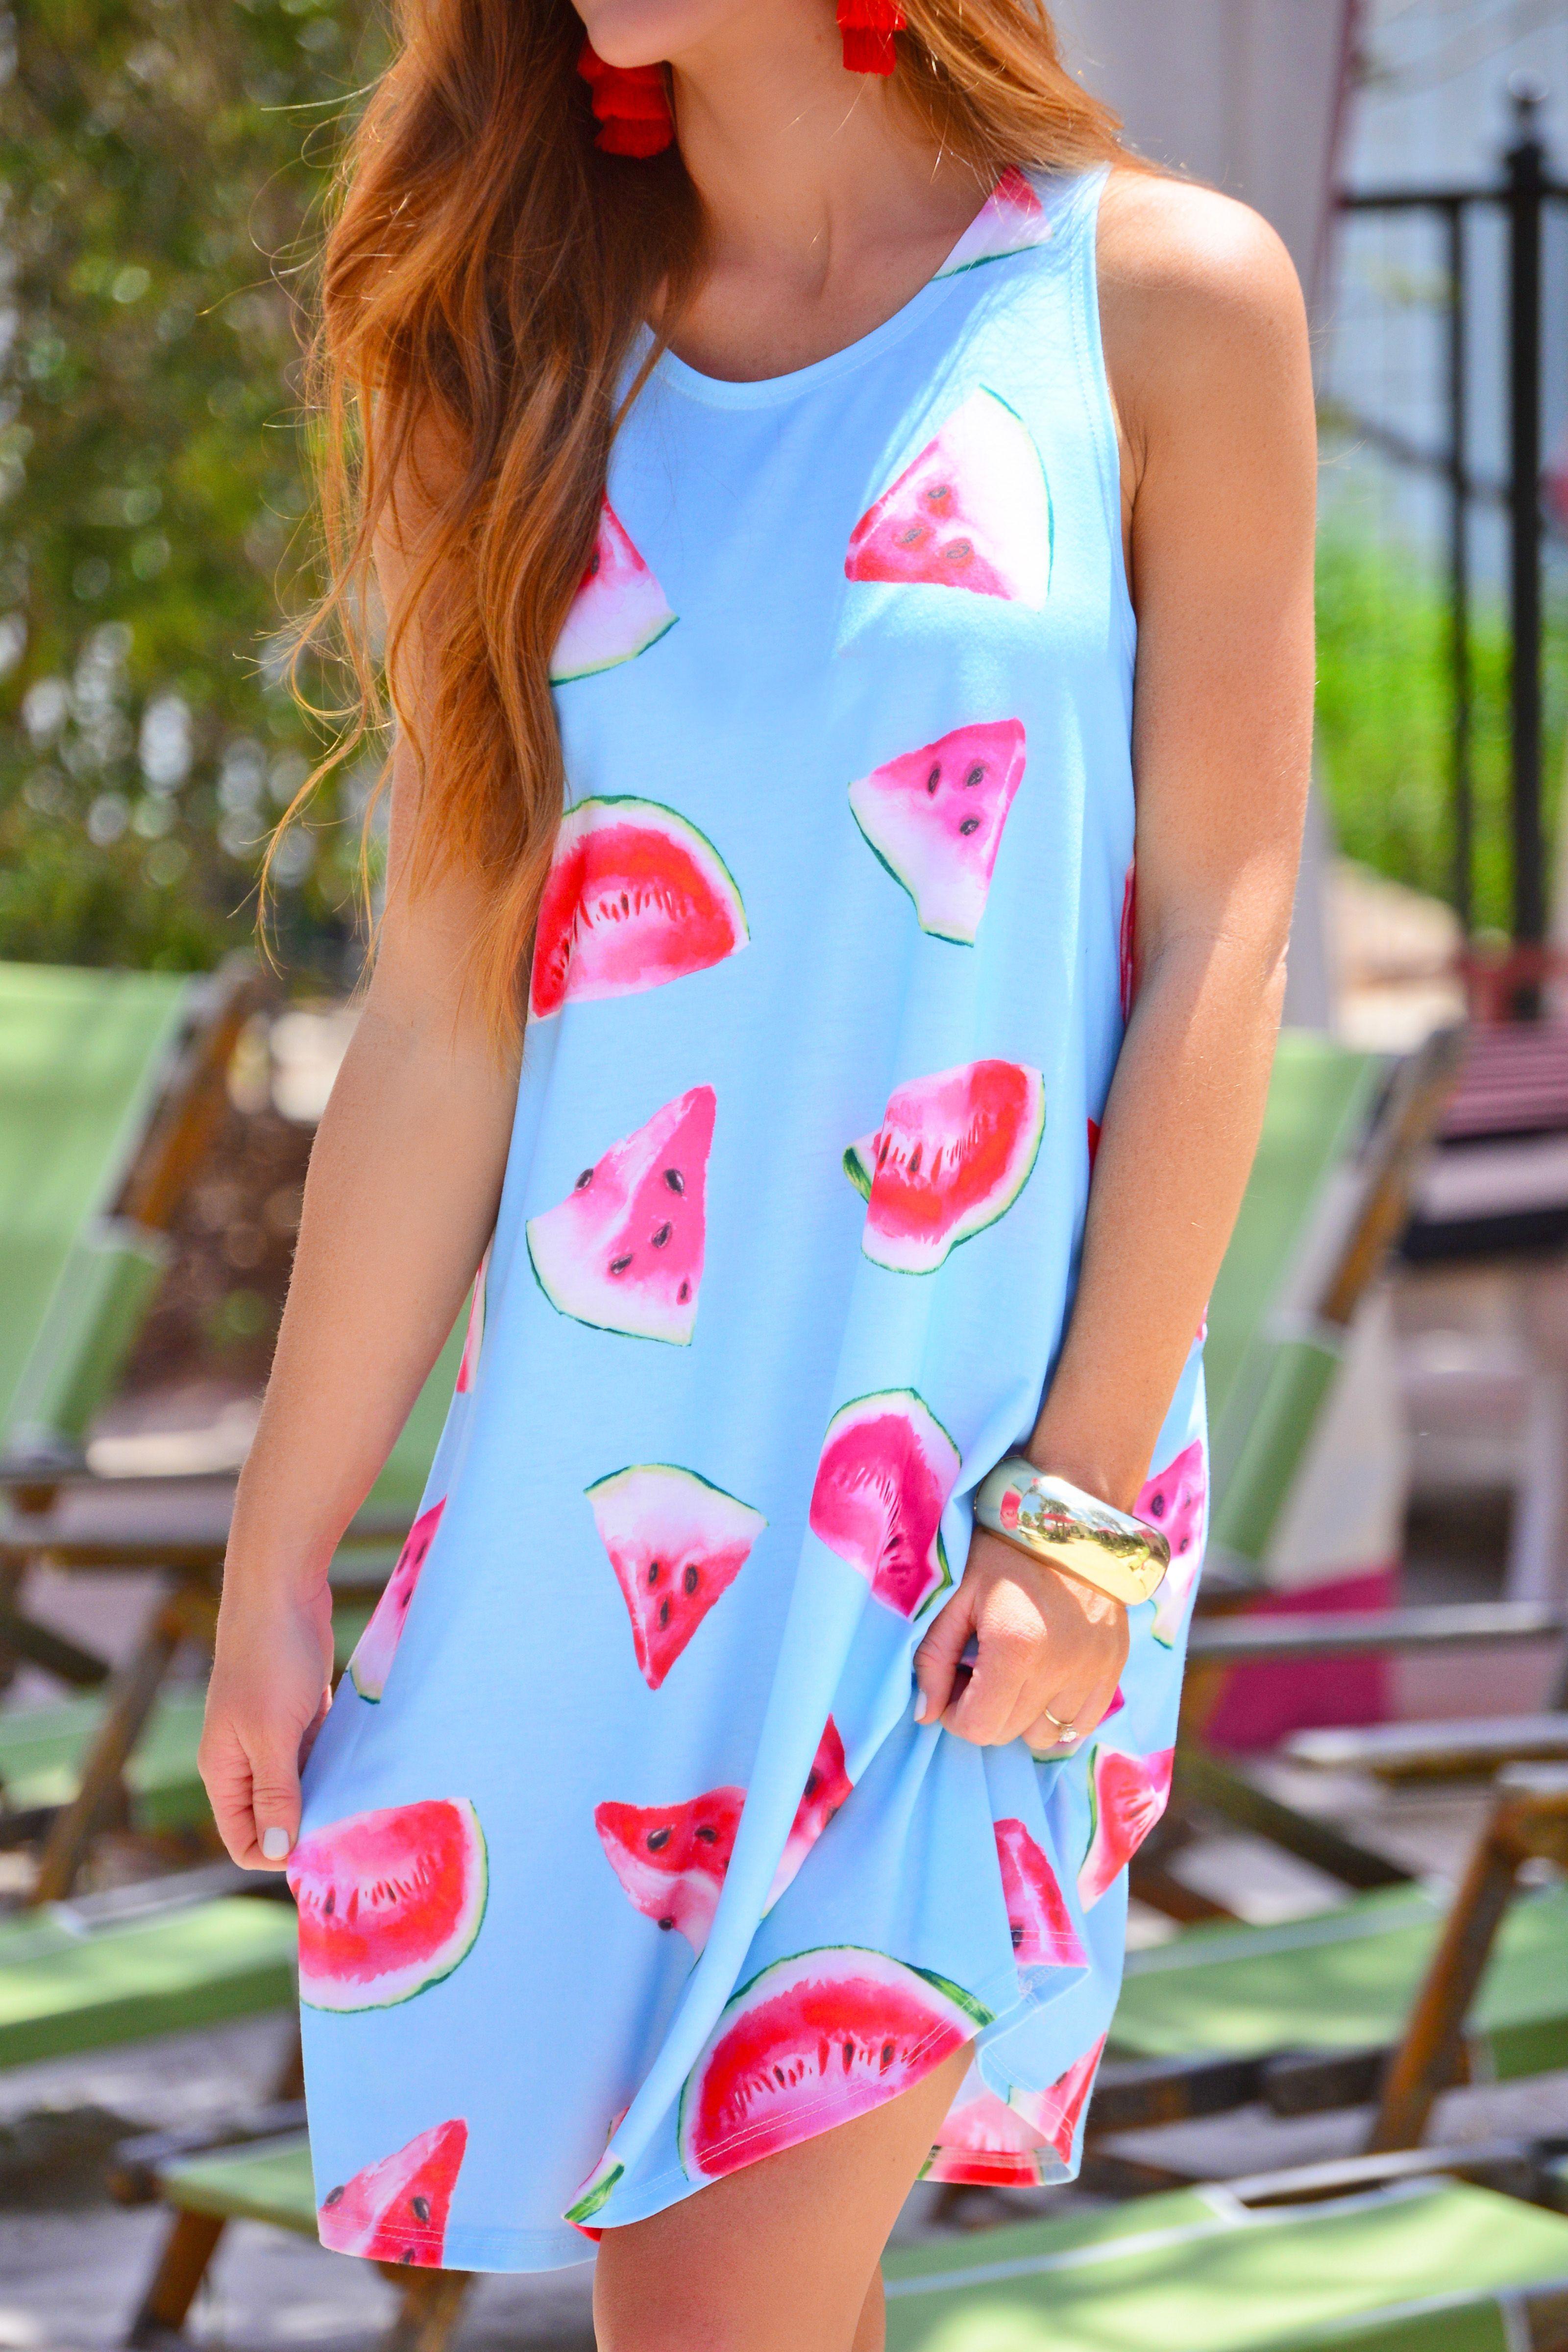 A Swingy Summer Dress With The Cutest Print The Watermelon Print Pops Against The Sky Blue Color The A Line Shape Keeps It E Watermelon Dress Dresses Clothes [ 4800 x 3200 Pixel ]